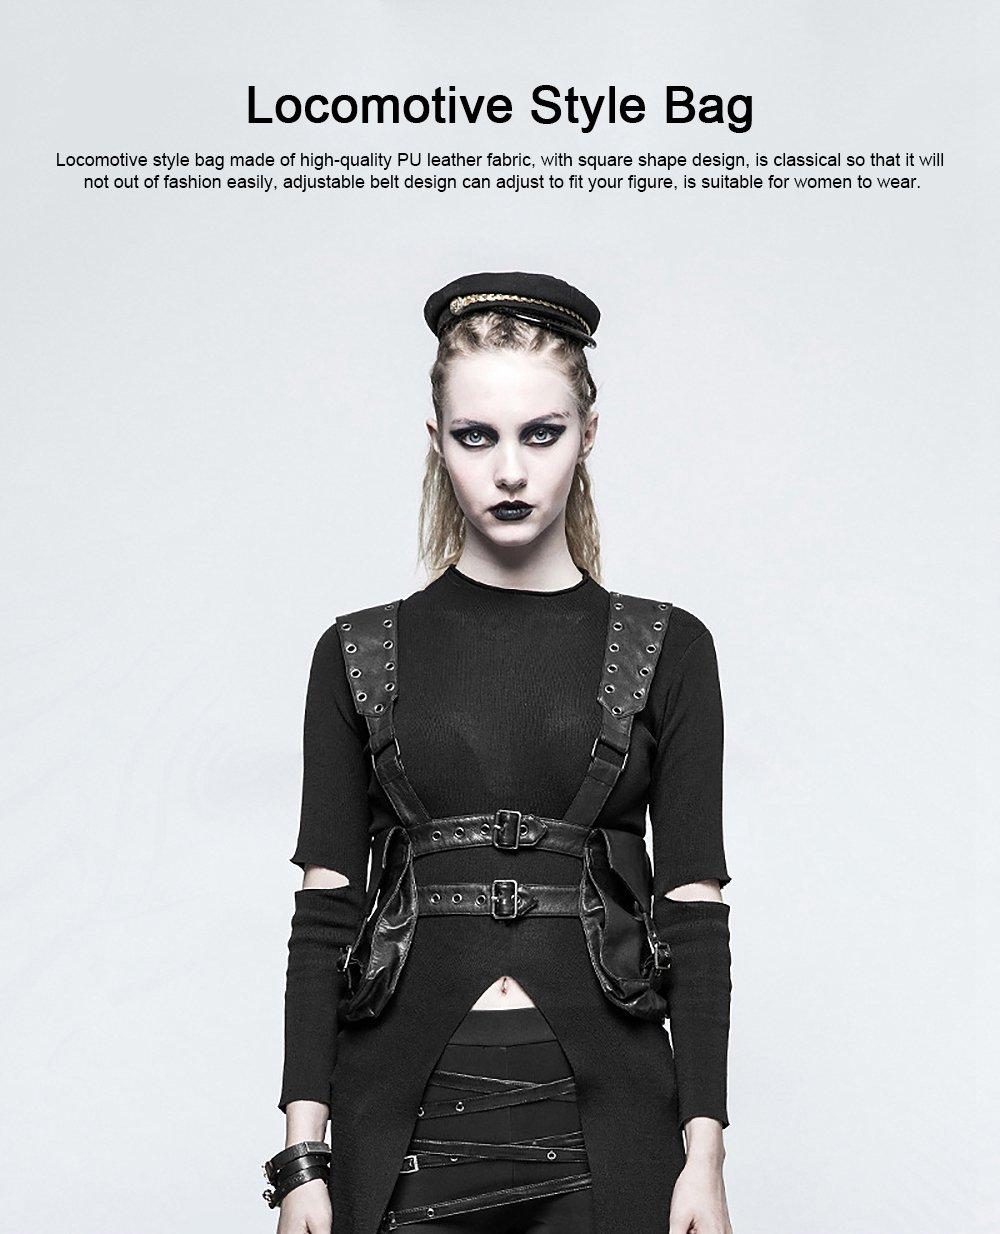 Square Shape Waist Strap Adjustable Belt Backpack, Locomotive Style Bag for Women, PU Leather Waistcoat Halloween Gift 0